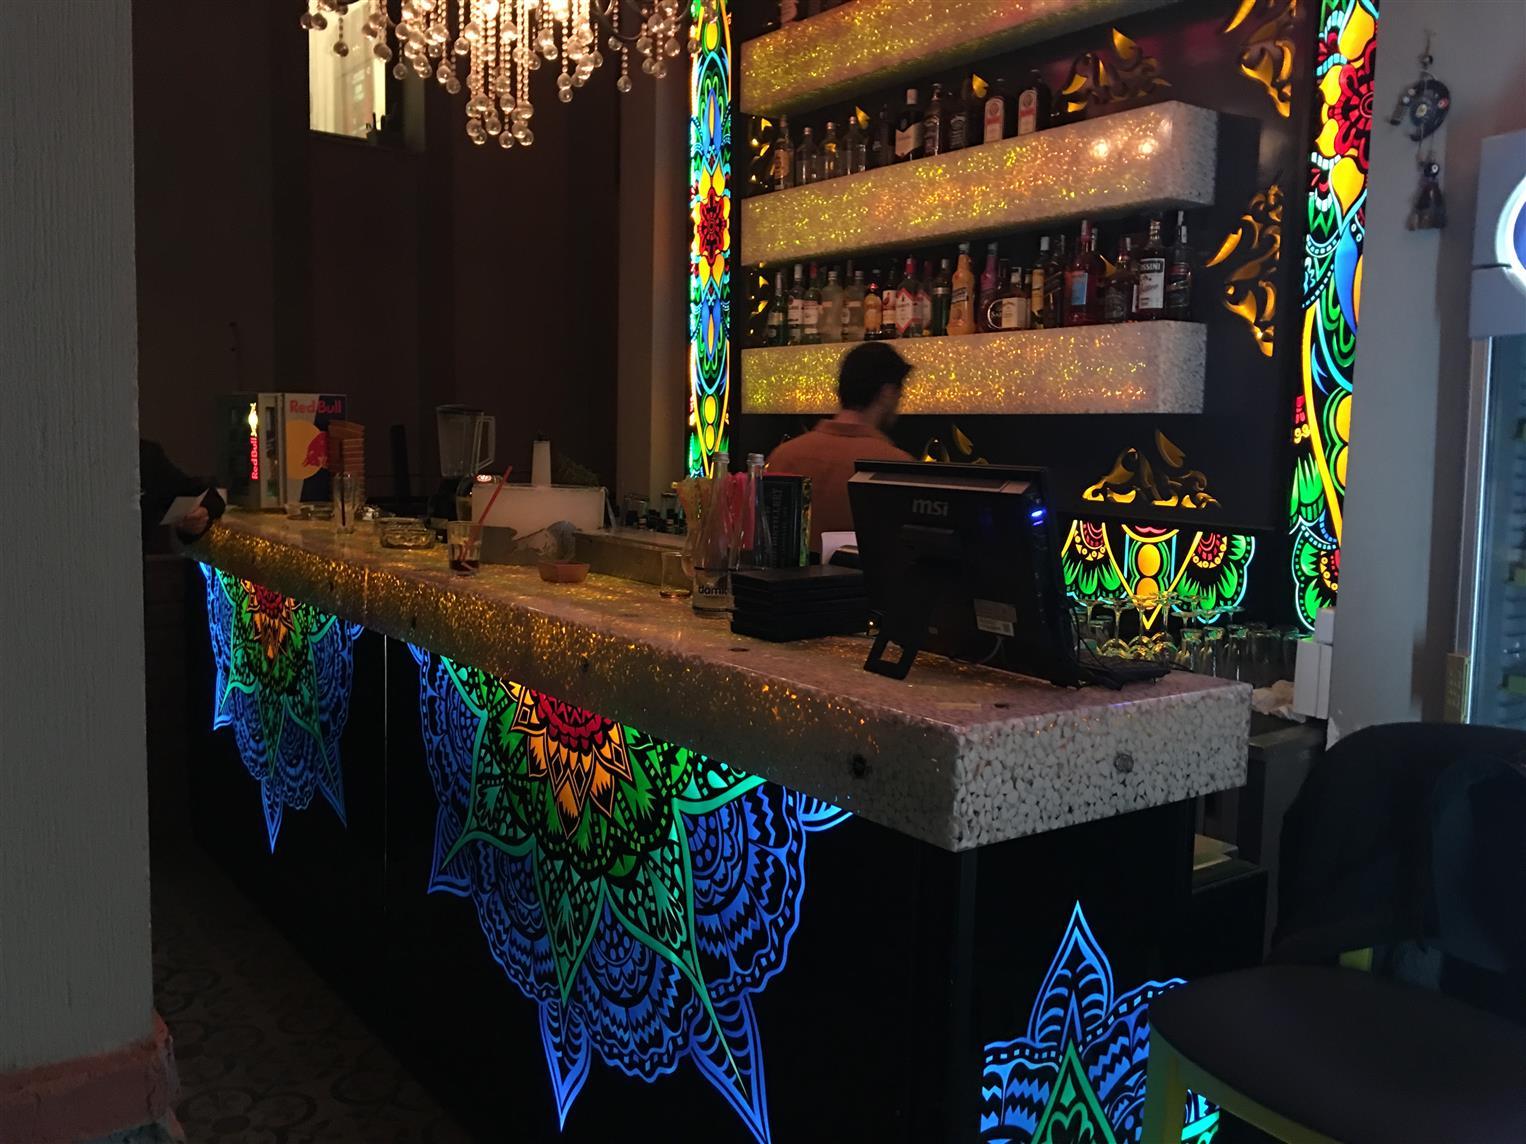 maitia-restoran-guzelyali201652135853888.jpg izmir vitray çalışması